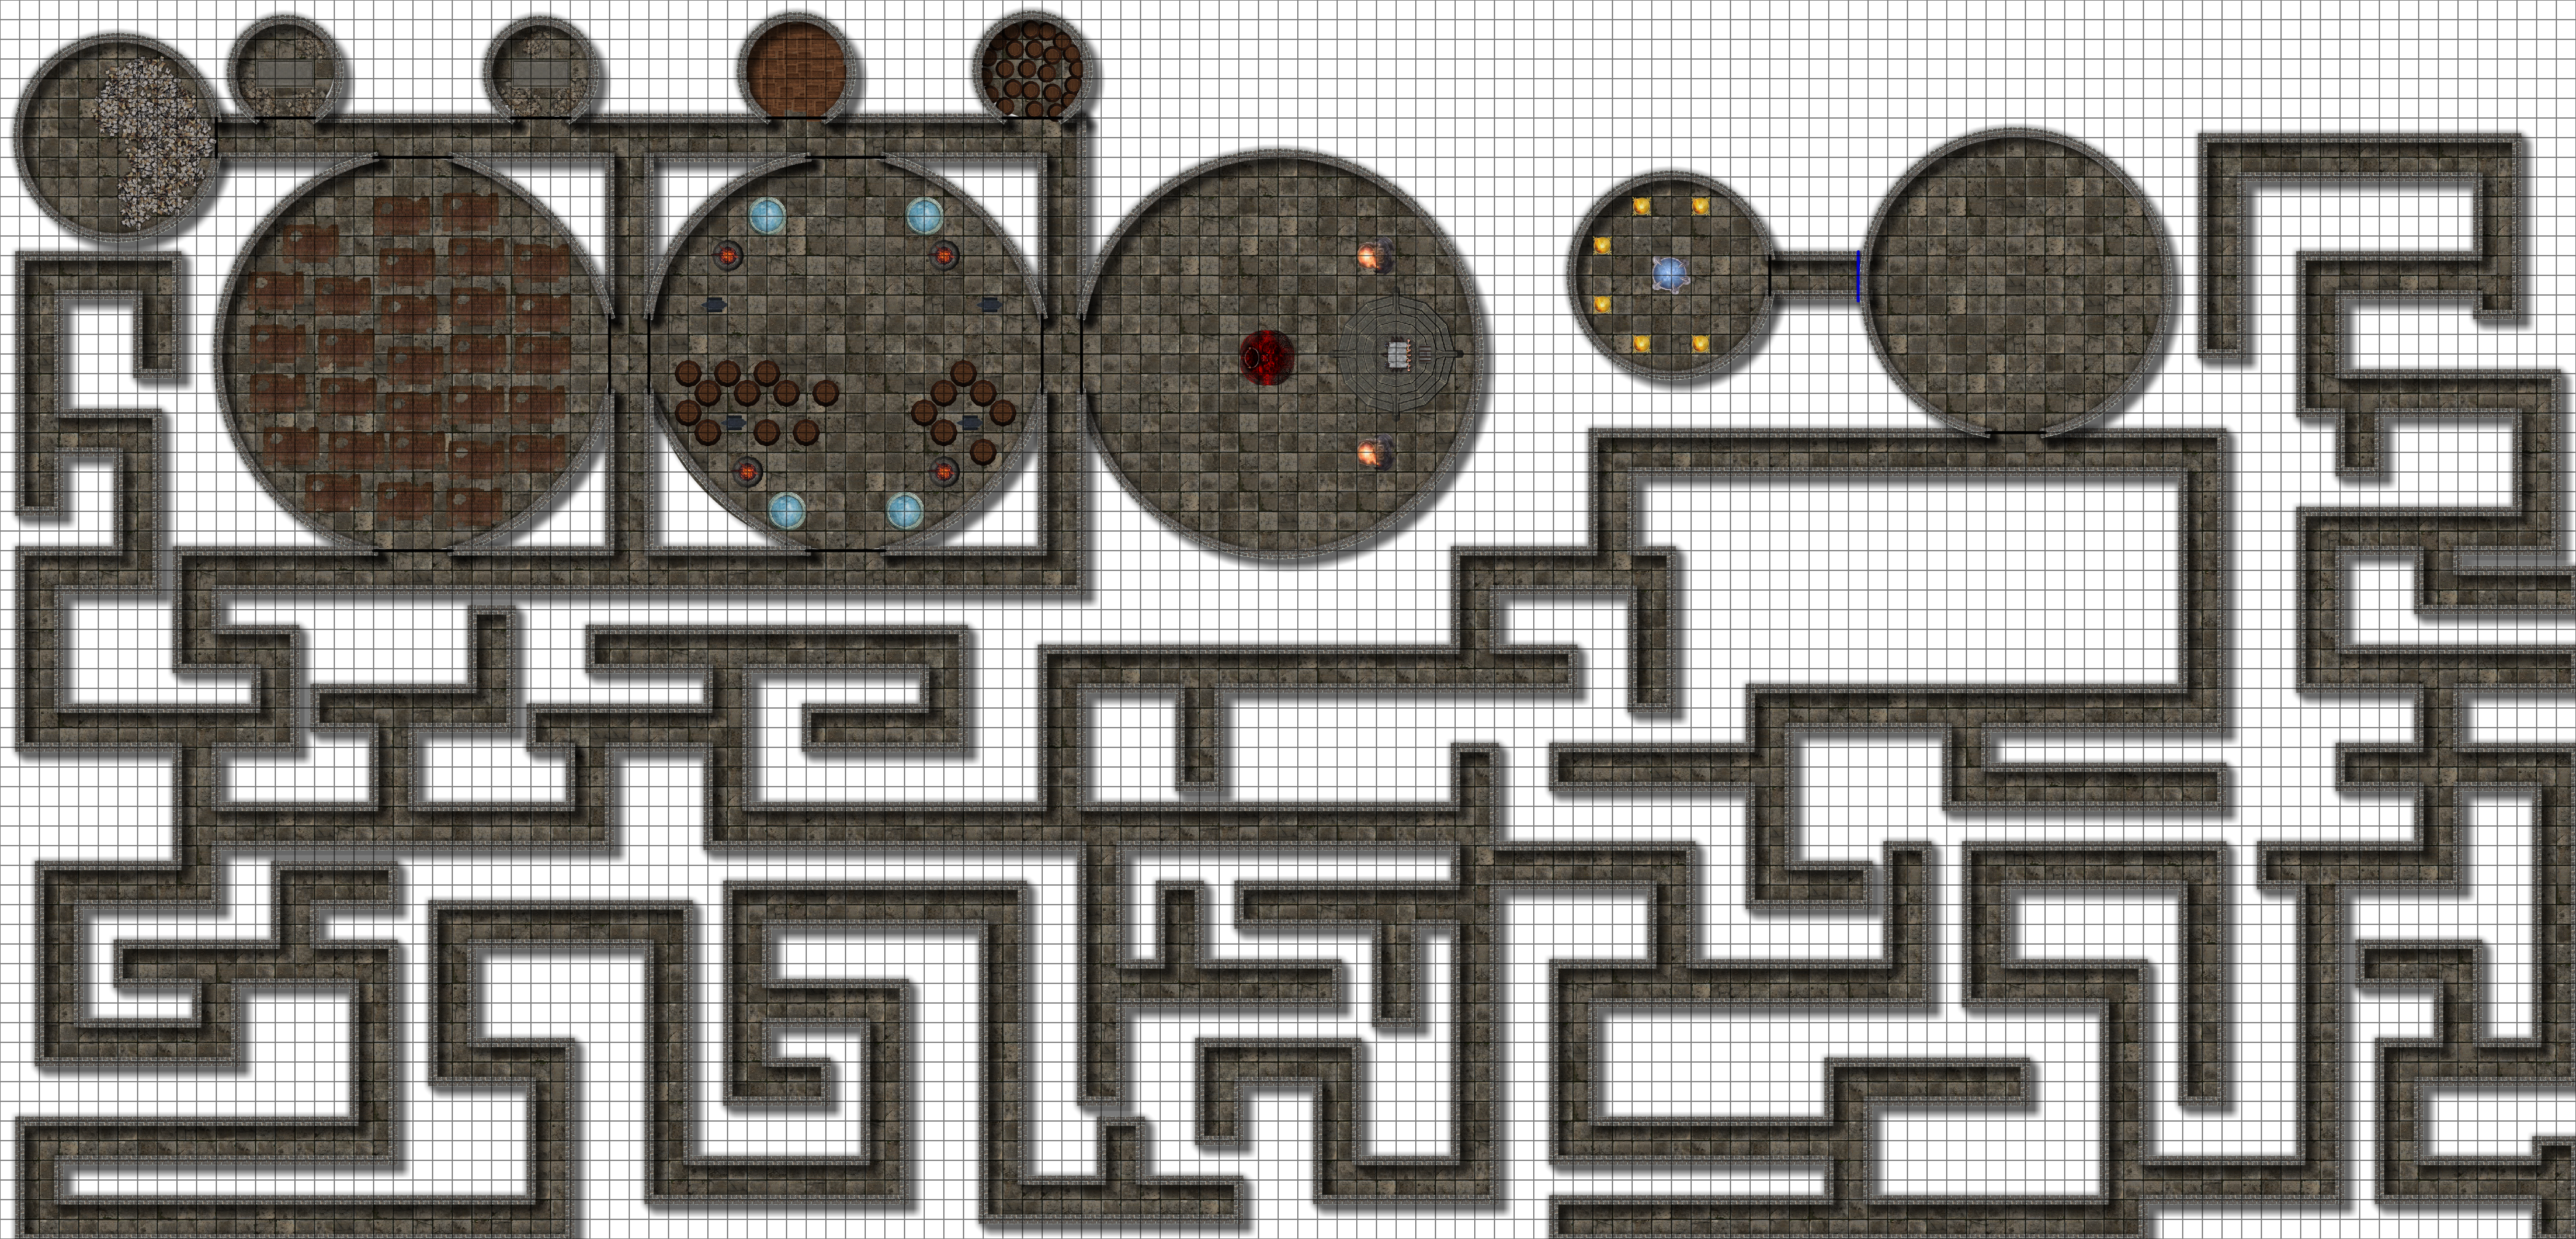 Shuzal 2 Grid 131x63